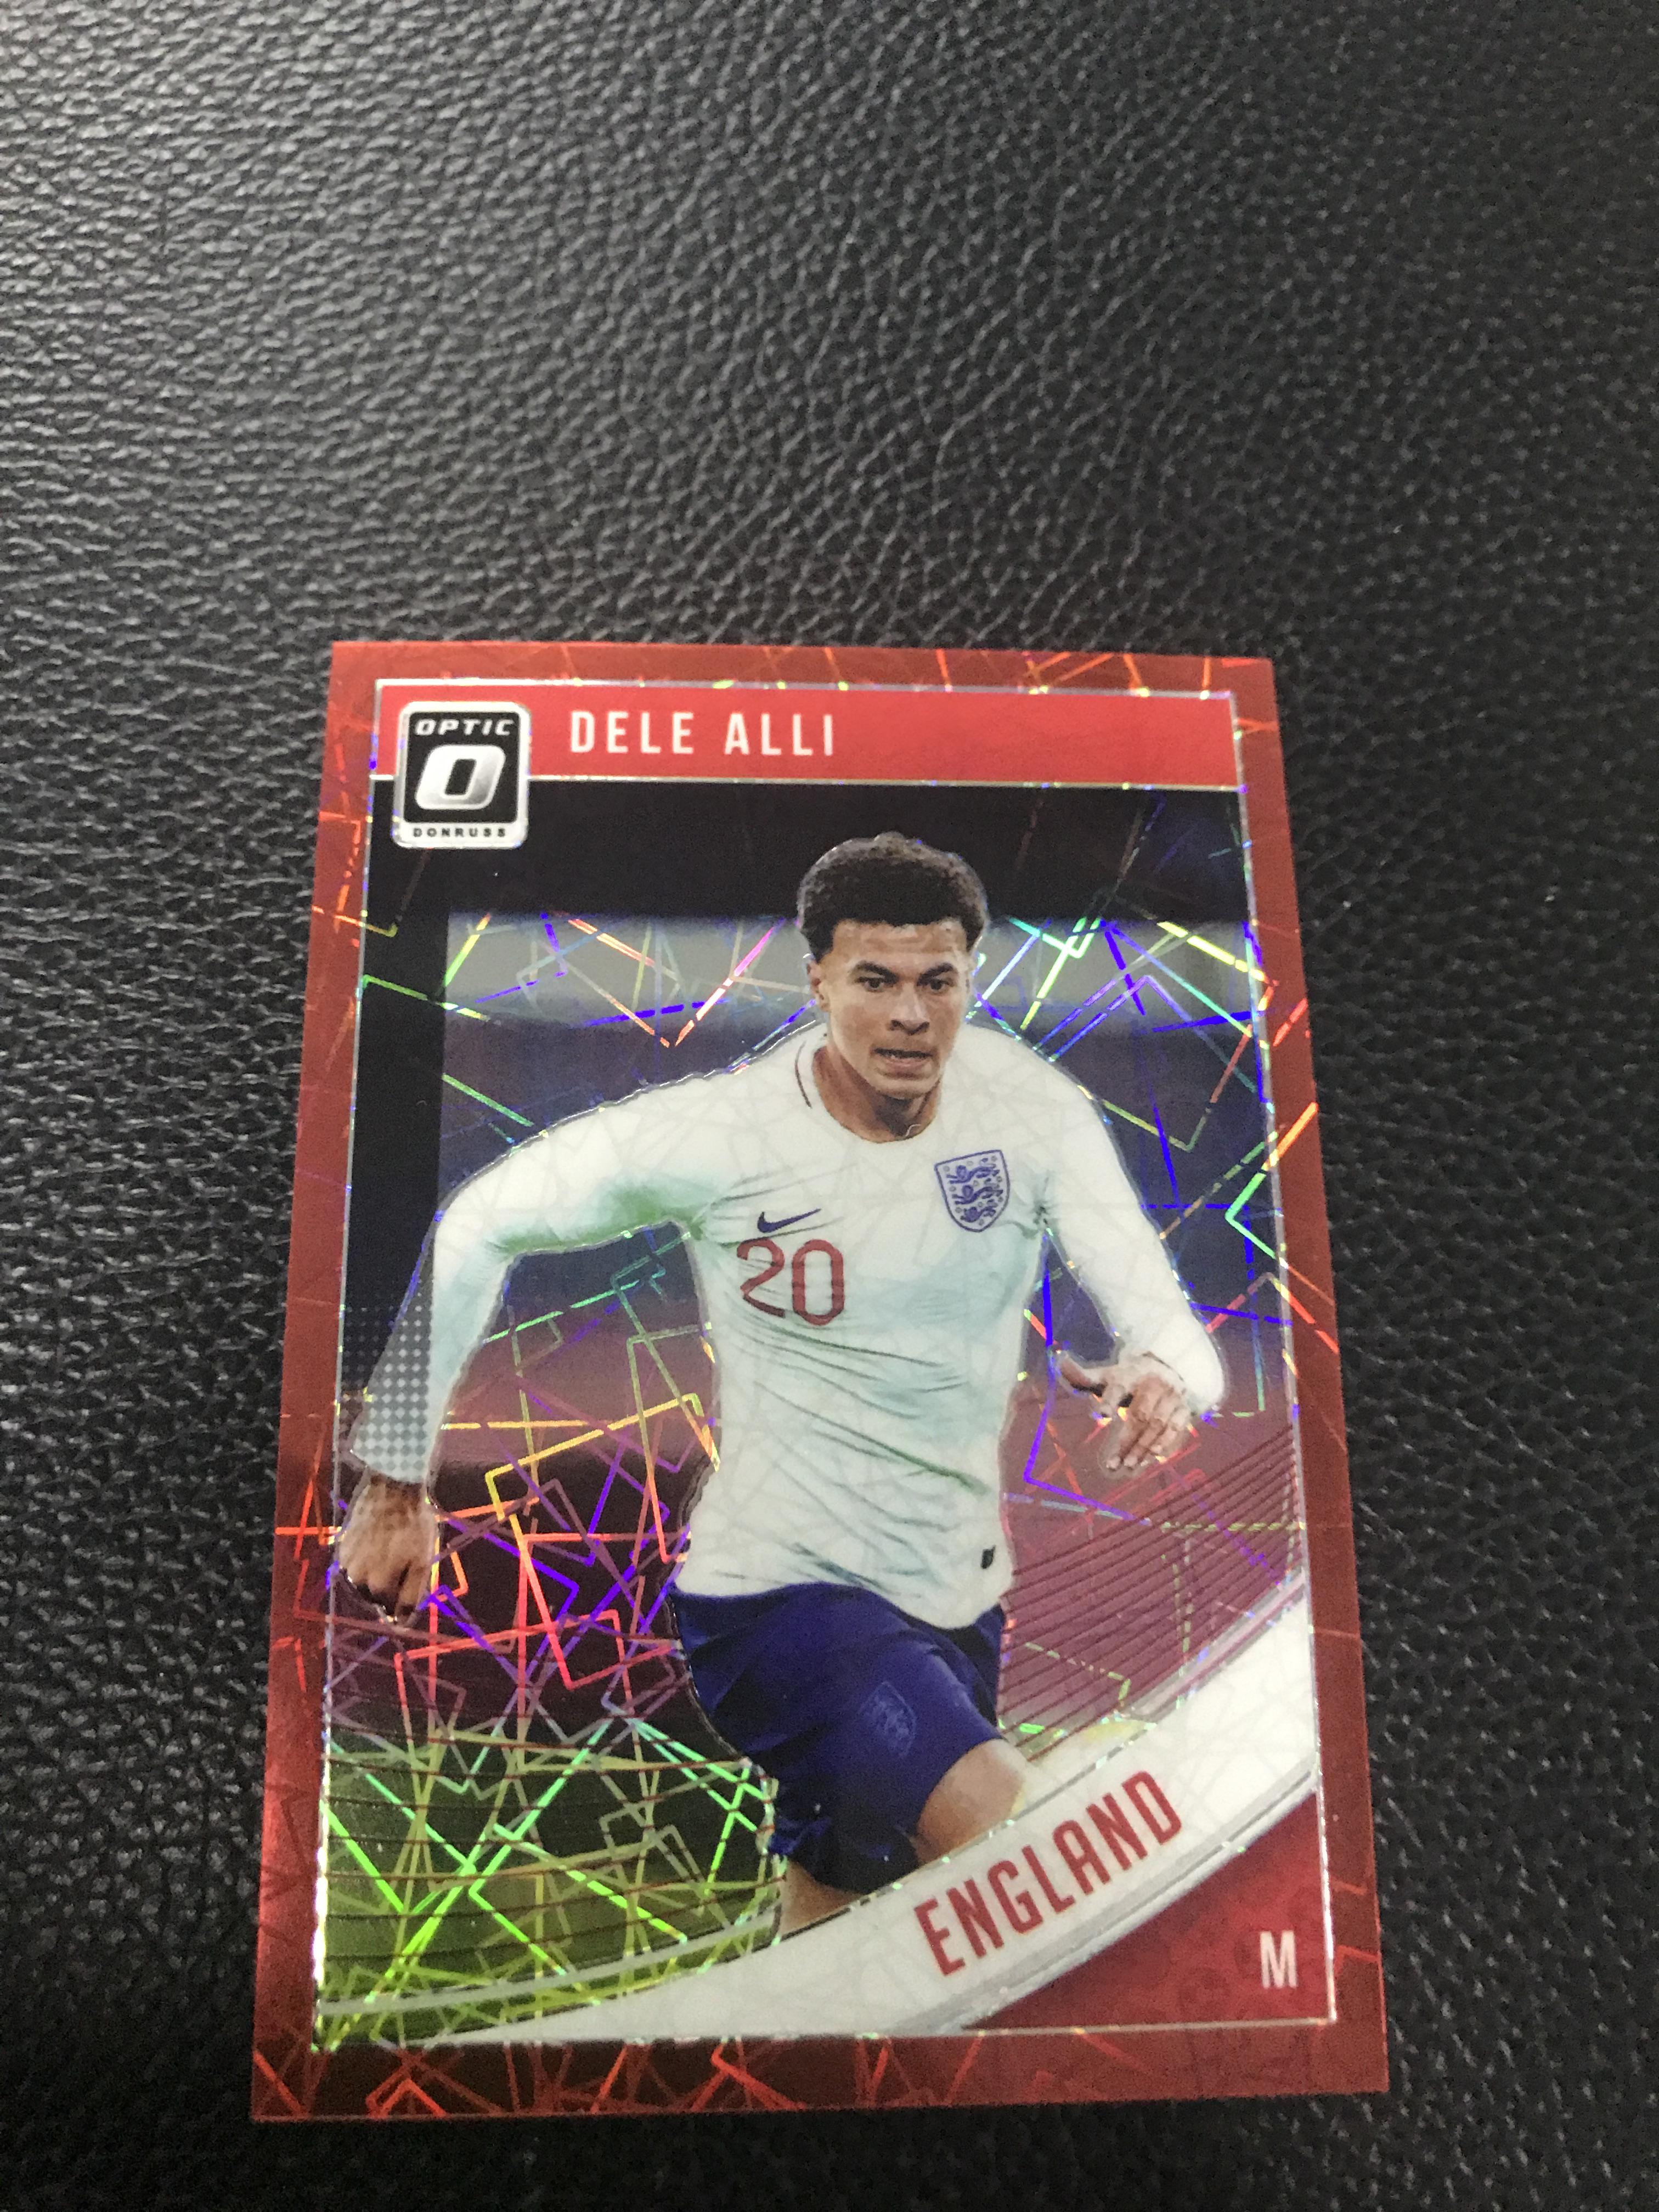 【LZK18】2019 足球 donruss 系列  chrome版本 50编红射线折射  英格兰 热刺中场 阿里!